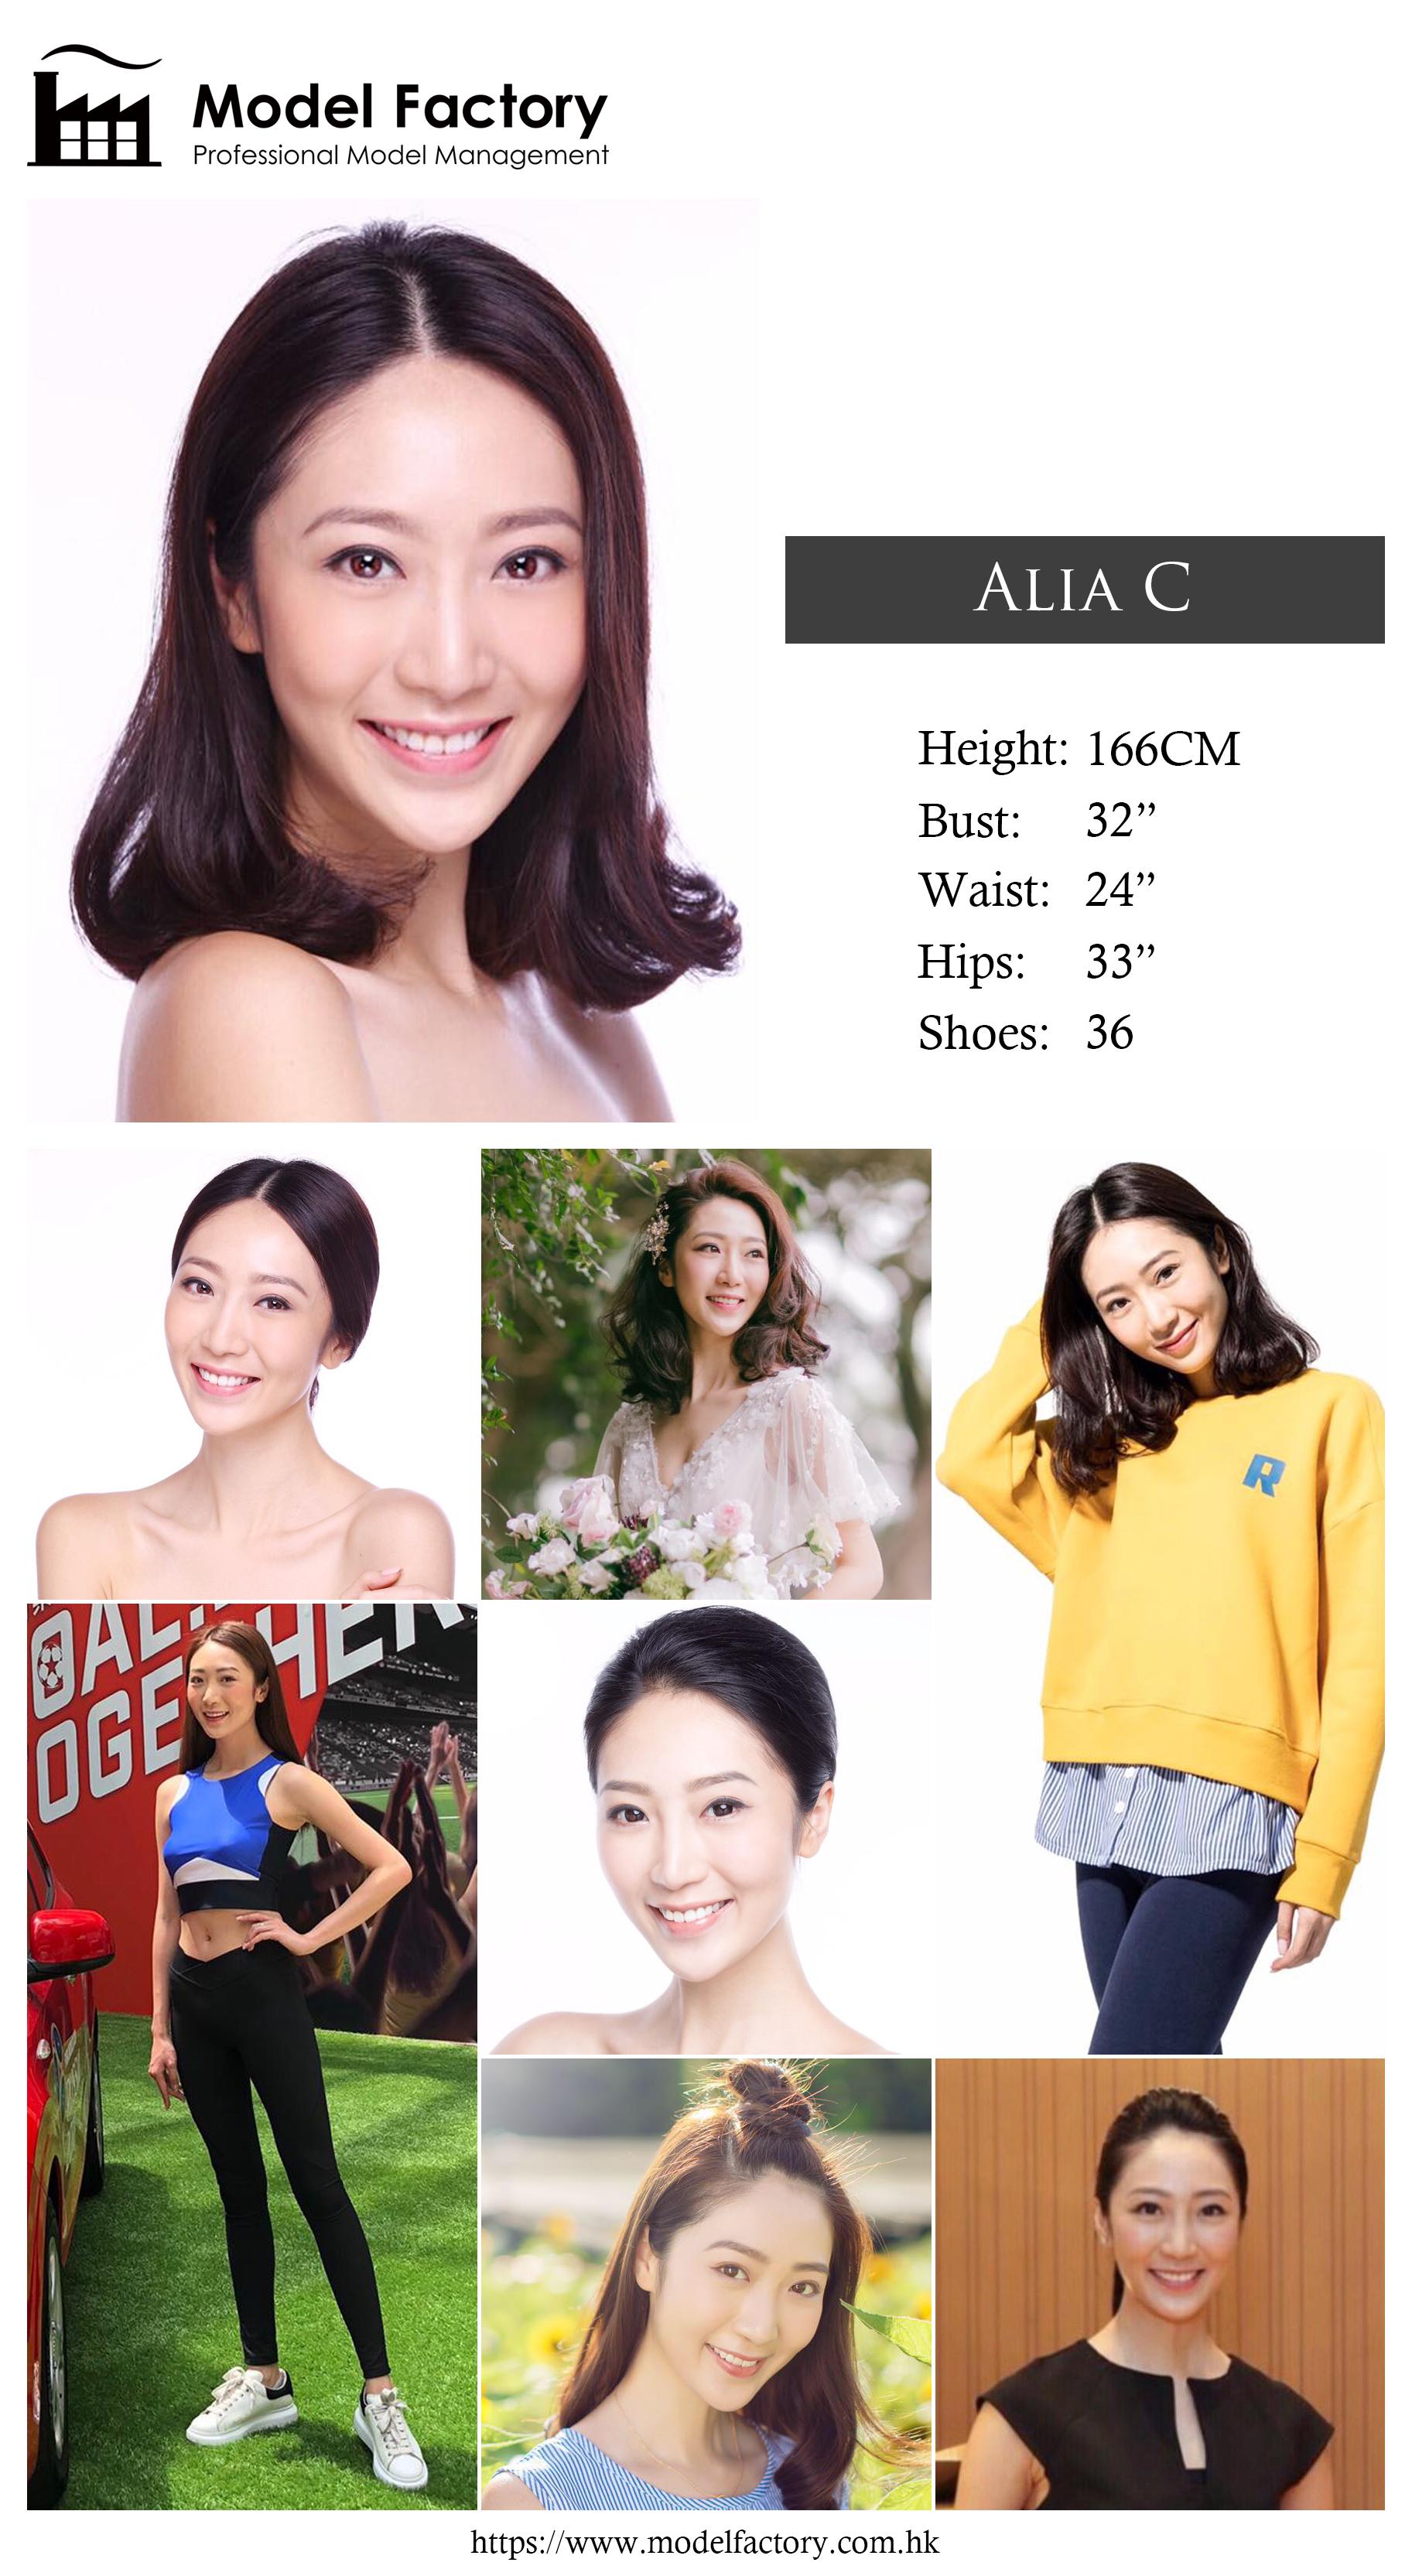 Model Factory Hong Kong Female Model AliaC